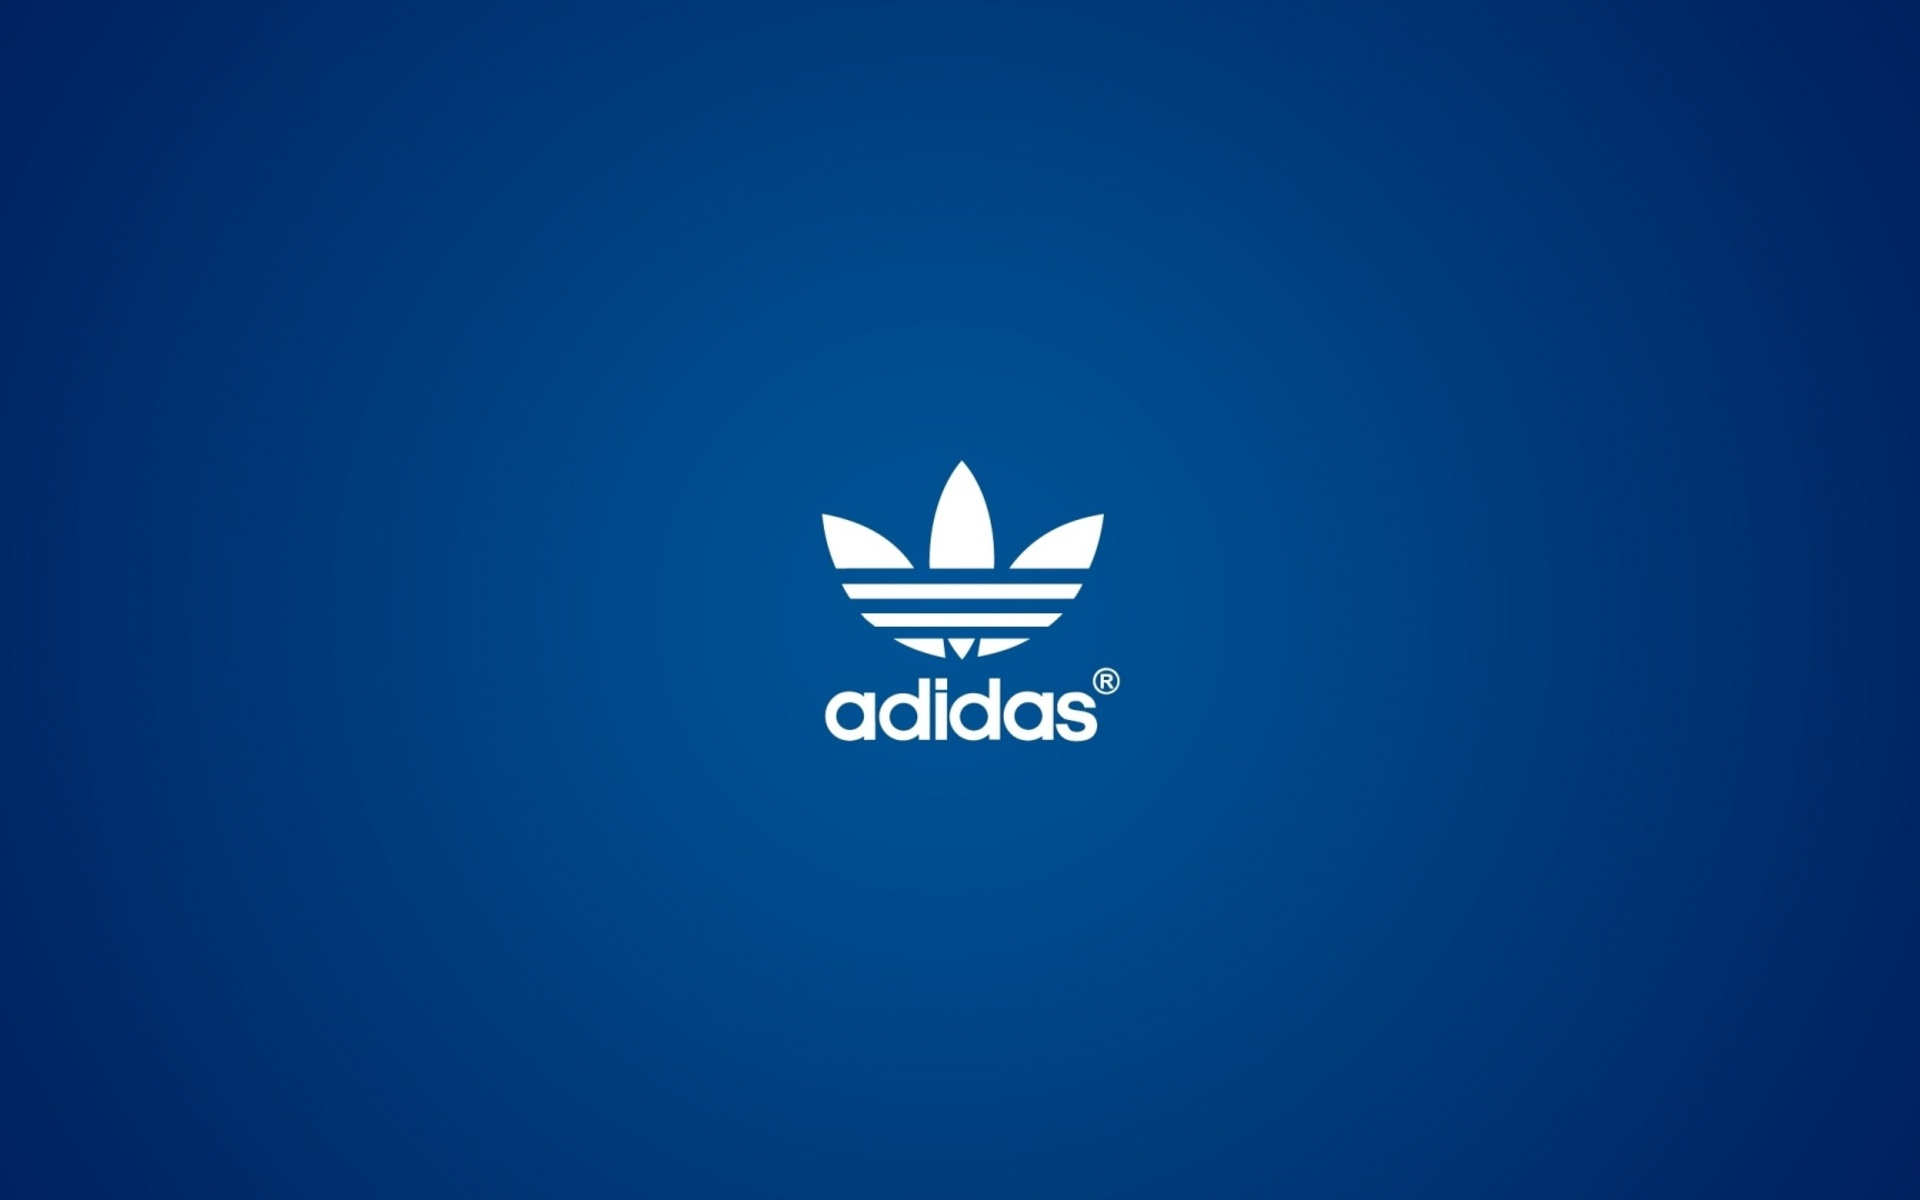 Description Download Hd Adidas Black And White Logo 1920x1200